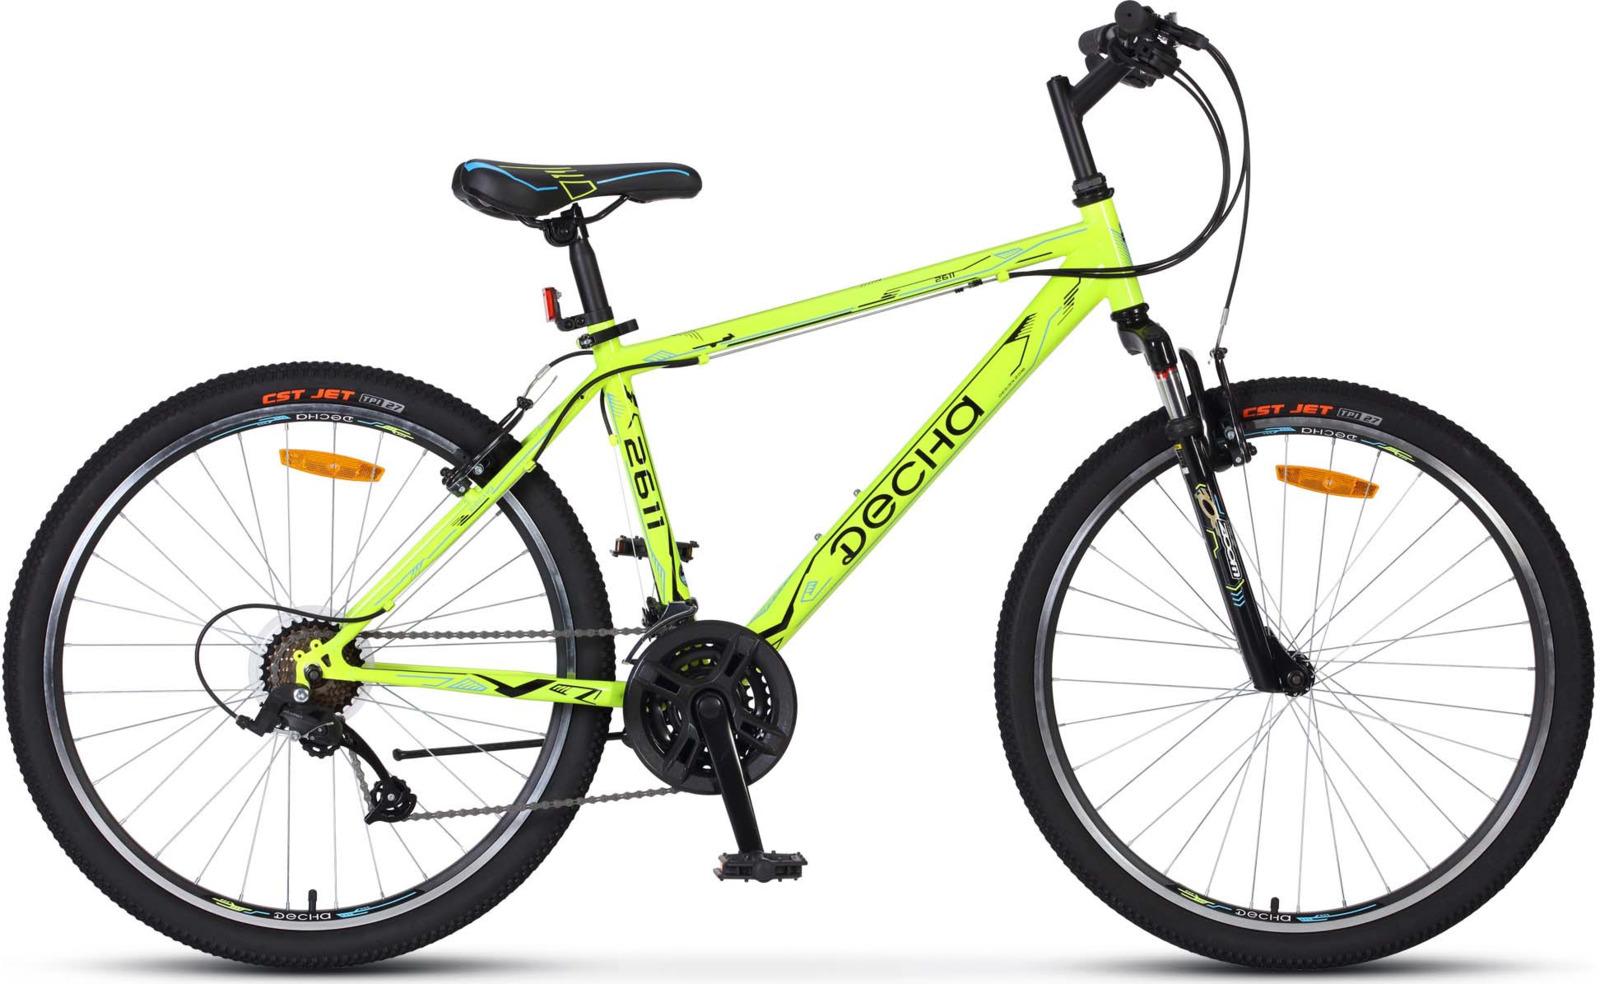 Велосипед Stels Десна-2611 V 19, KUBC0047172018, желтый